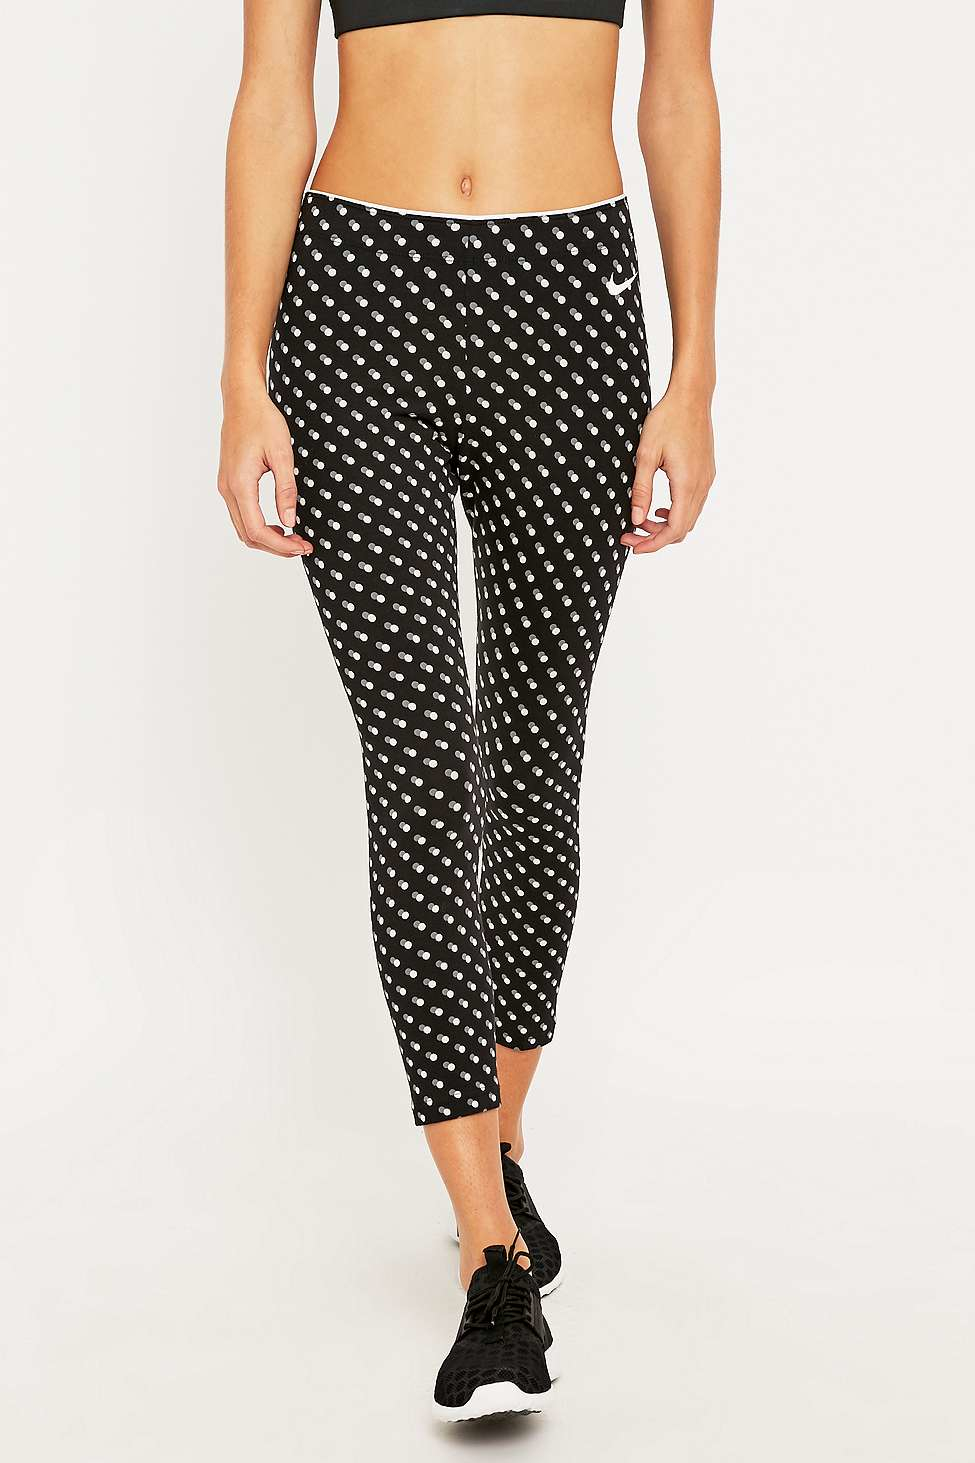 Nike Polka Dot Leggings in Black | Lyst